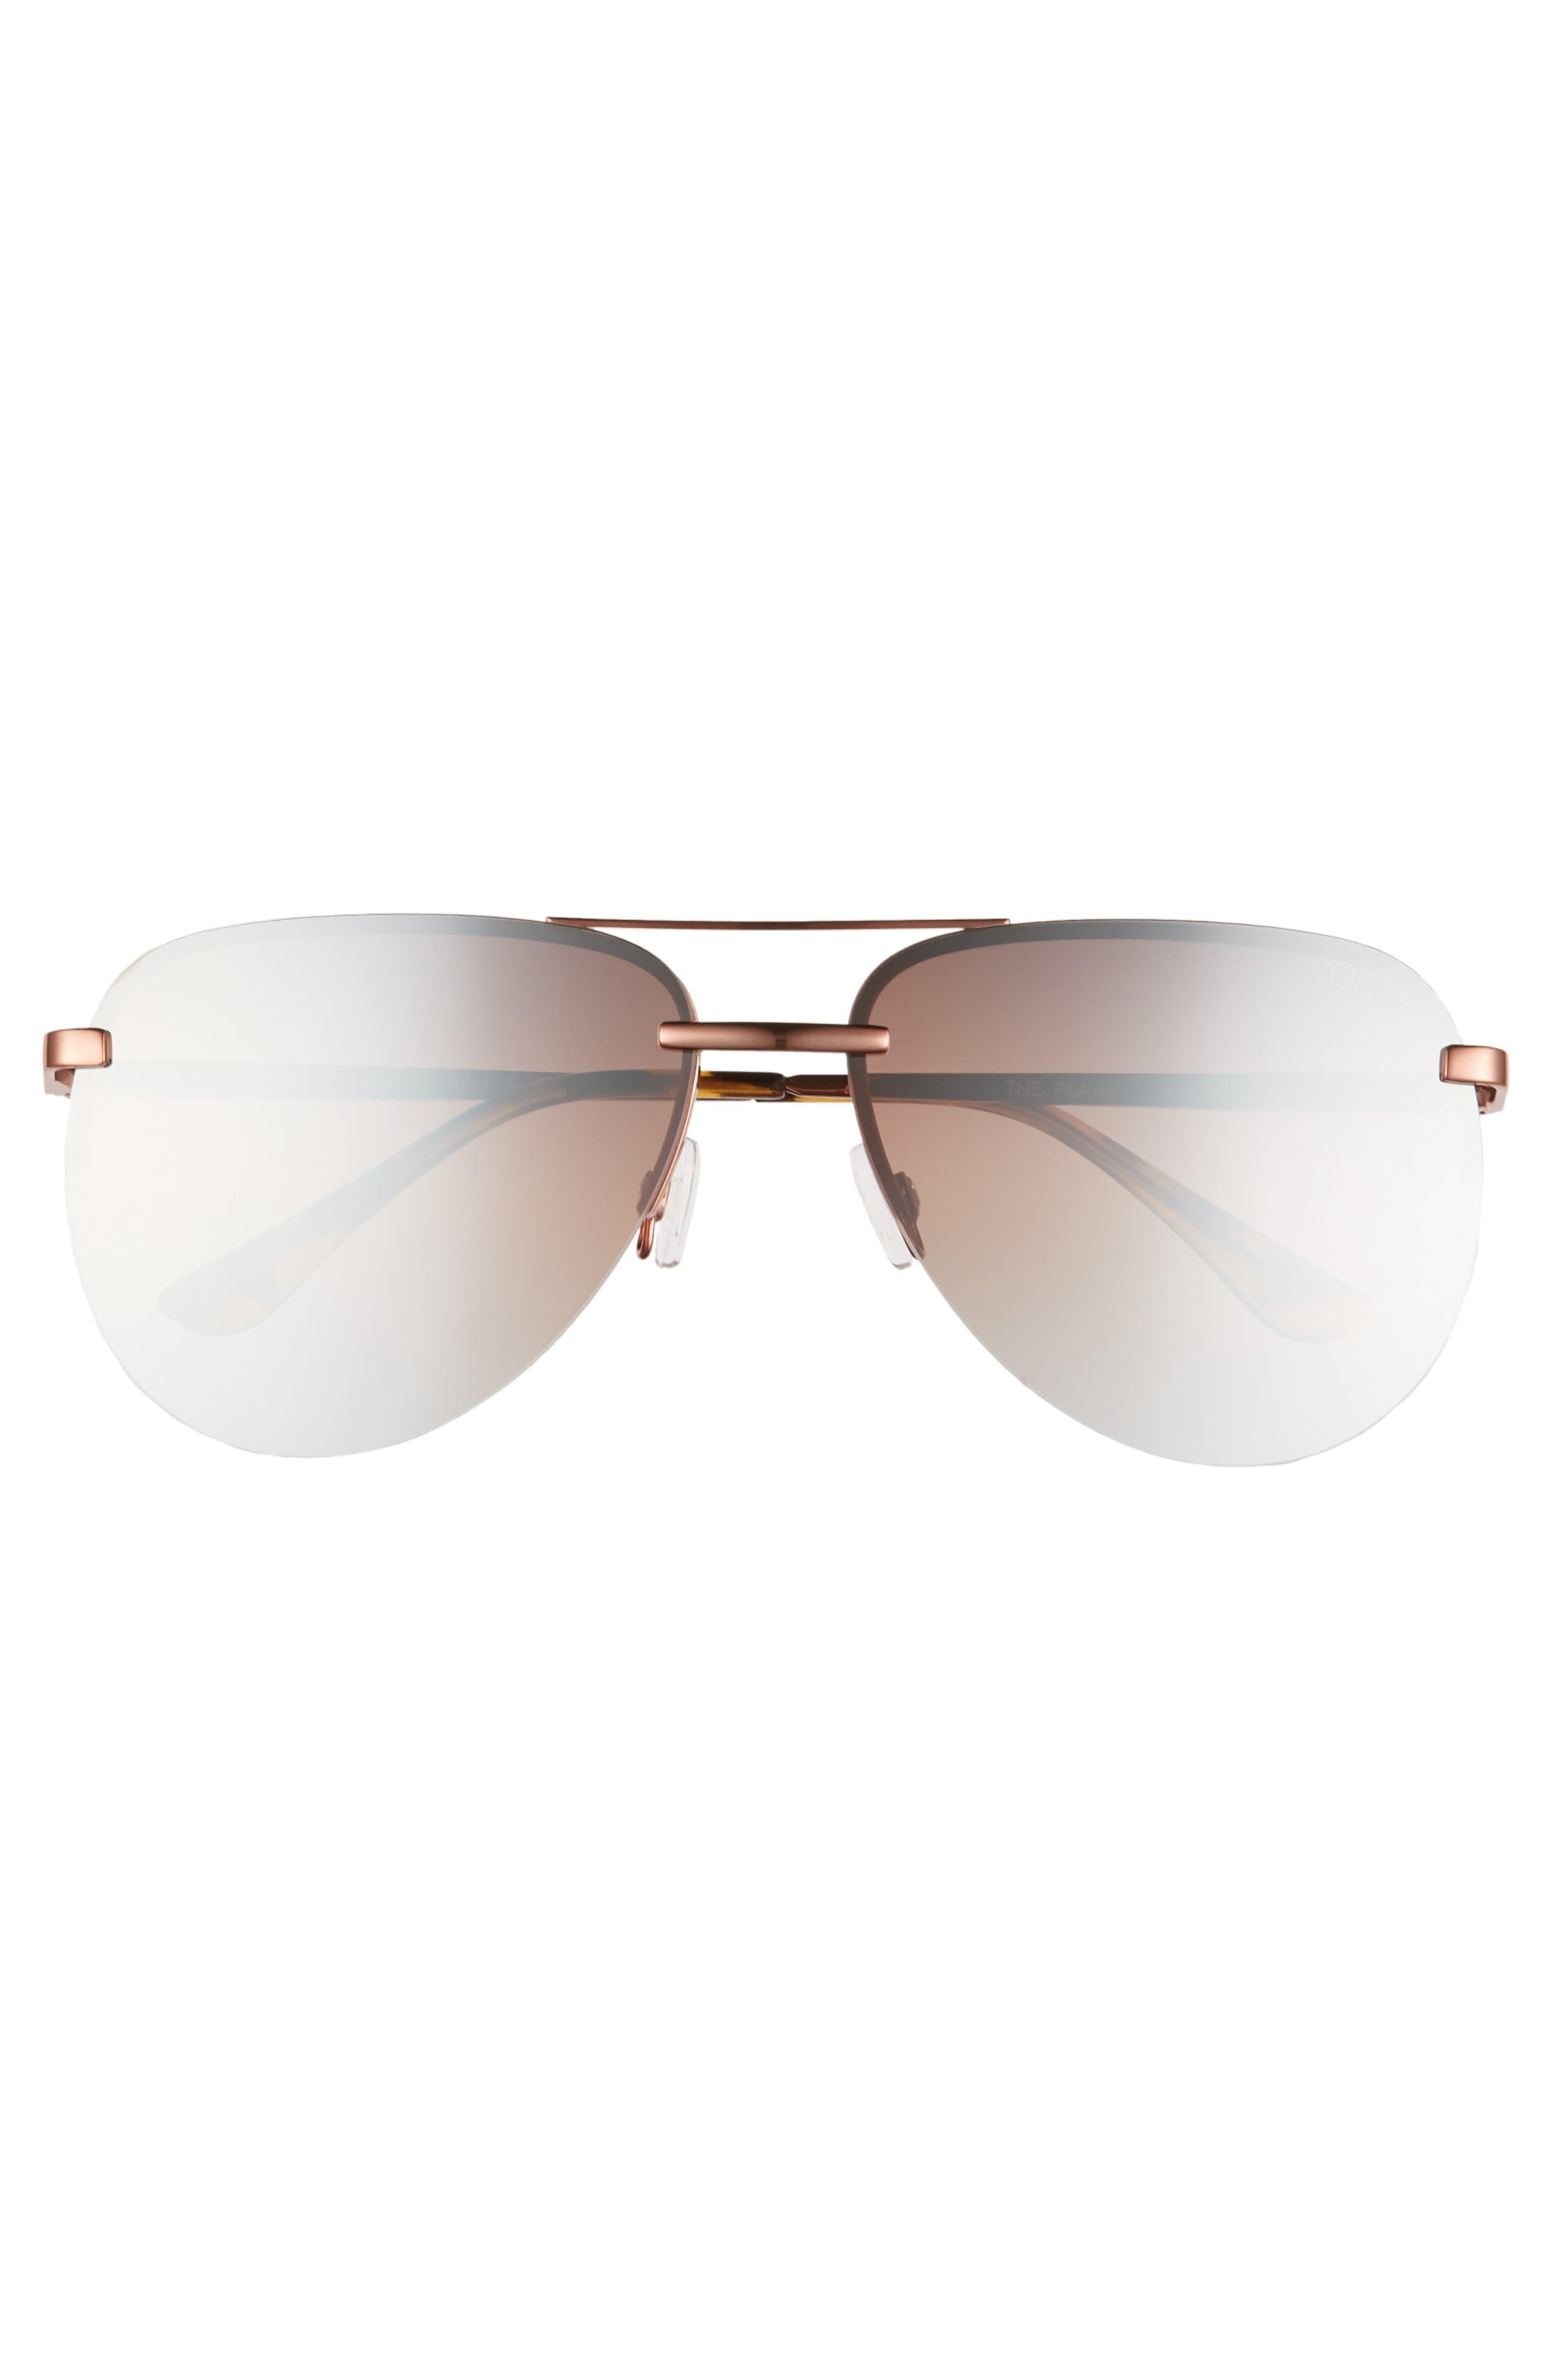 QUAY AUSTRALIA, x JLO The Playa 54mm Aviator Sunglasses, Alternate thumbnail 3, color, BRONZE/ BROWN